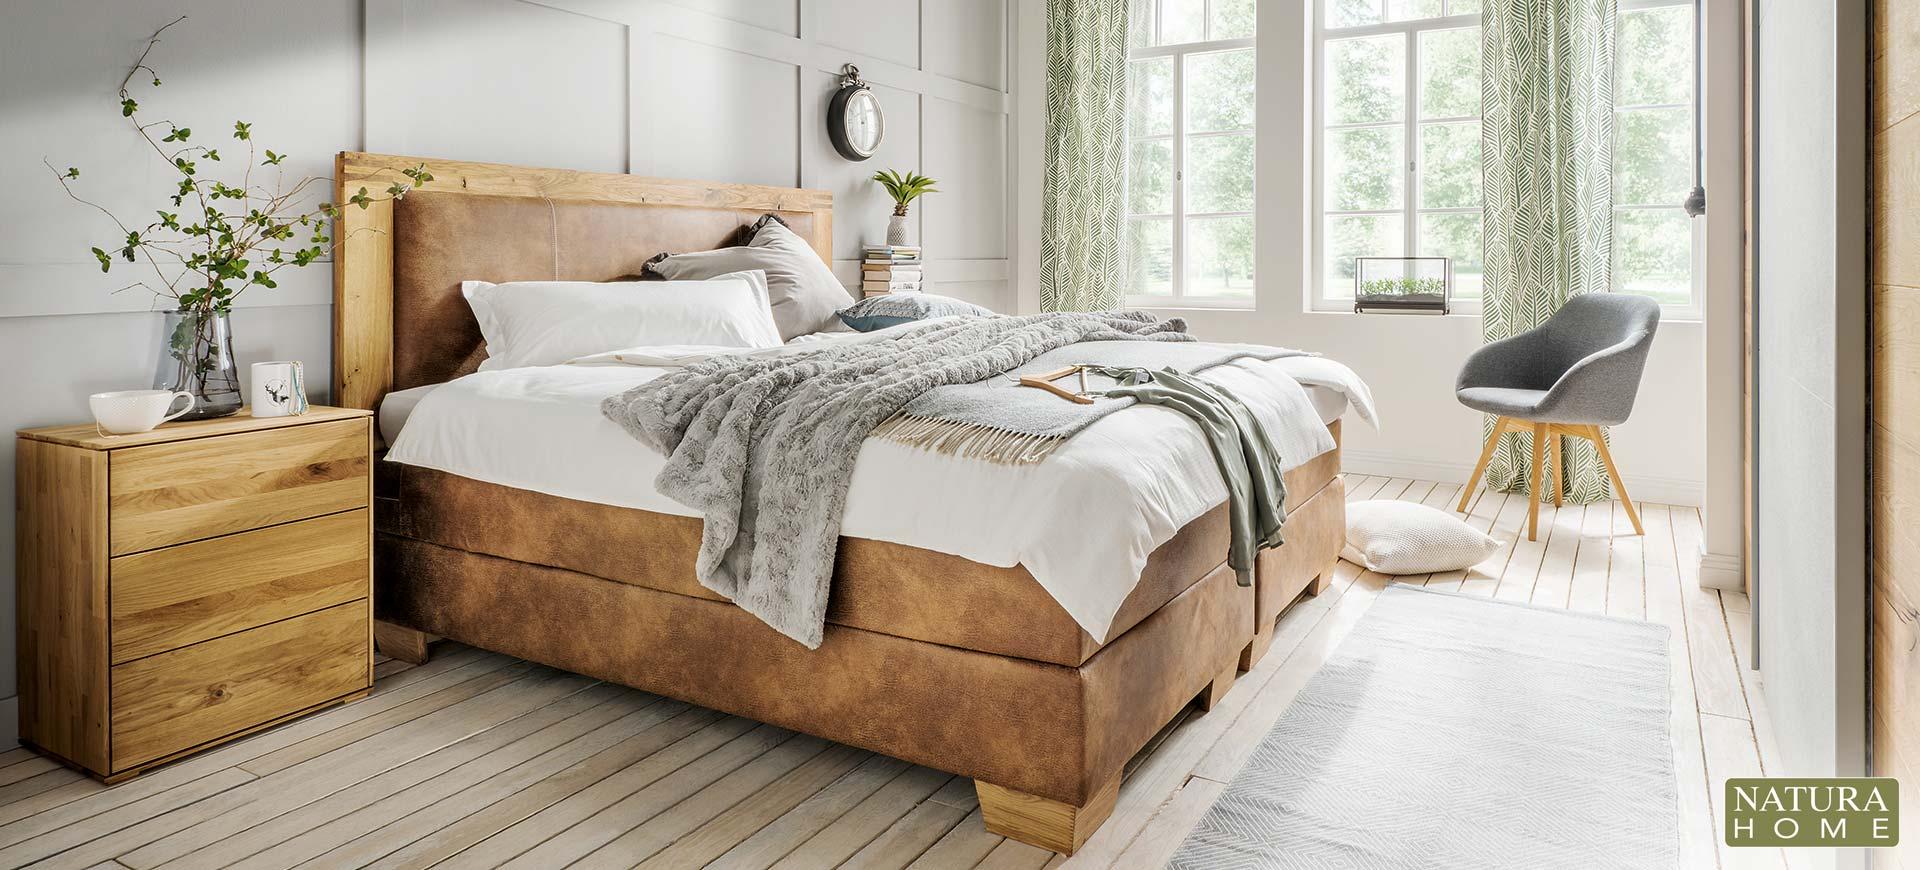 m bel u k chen reinecke unsere austellungr me in delmenhorst nahe bremen. Black Bedroom Furniture Sets. Home Design Ideas